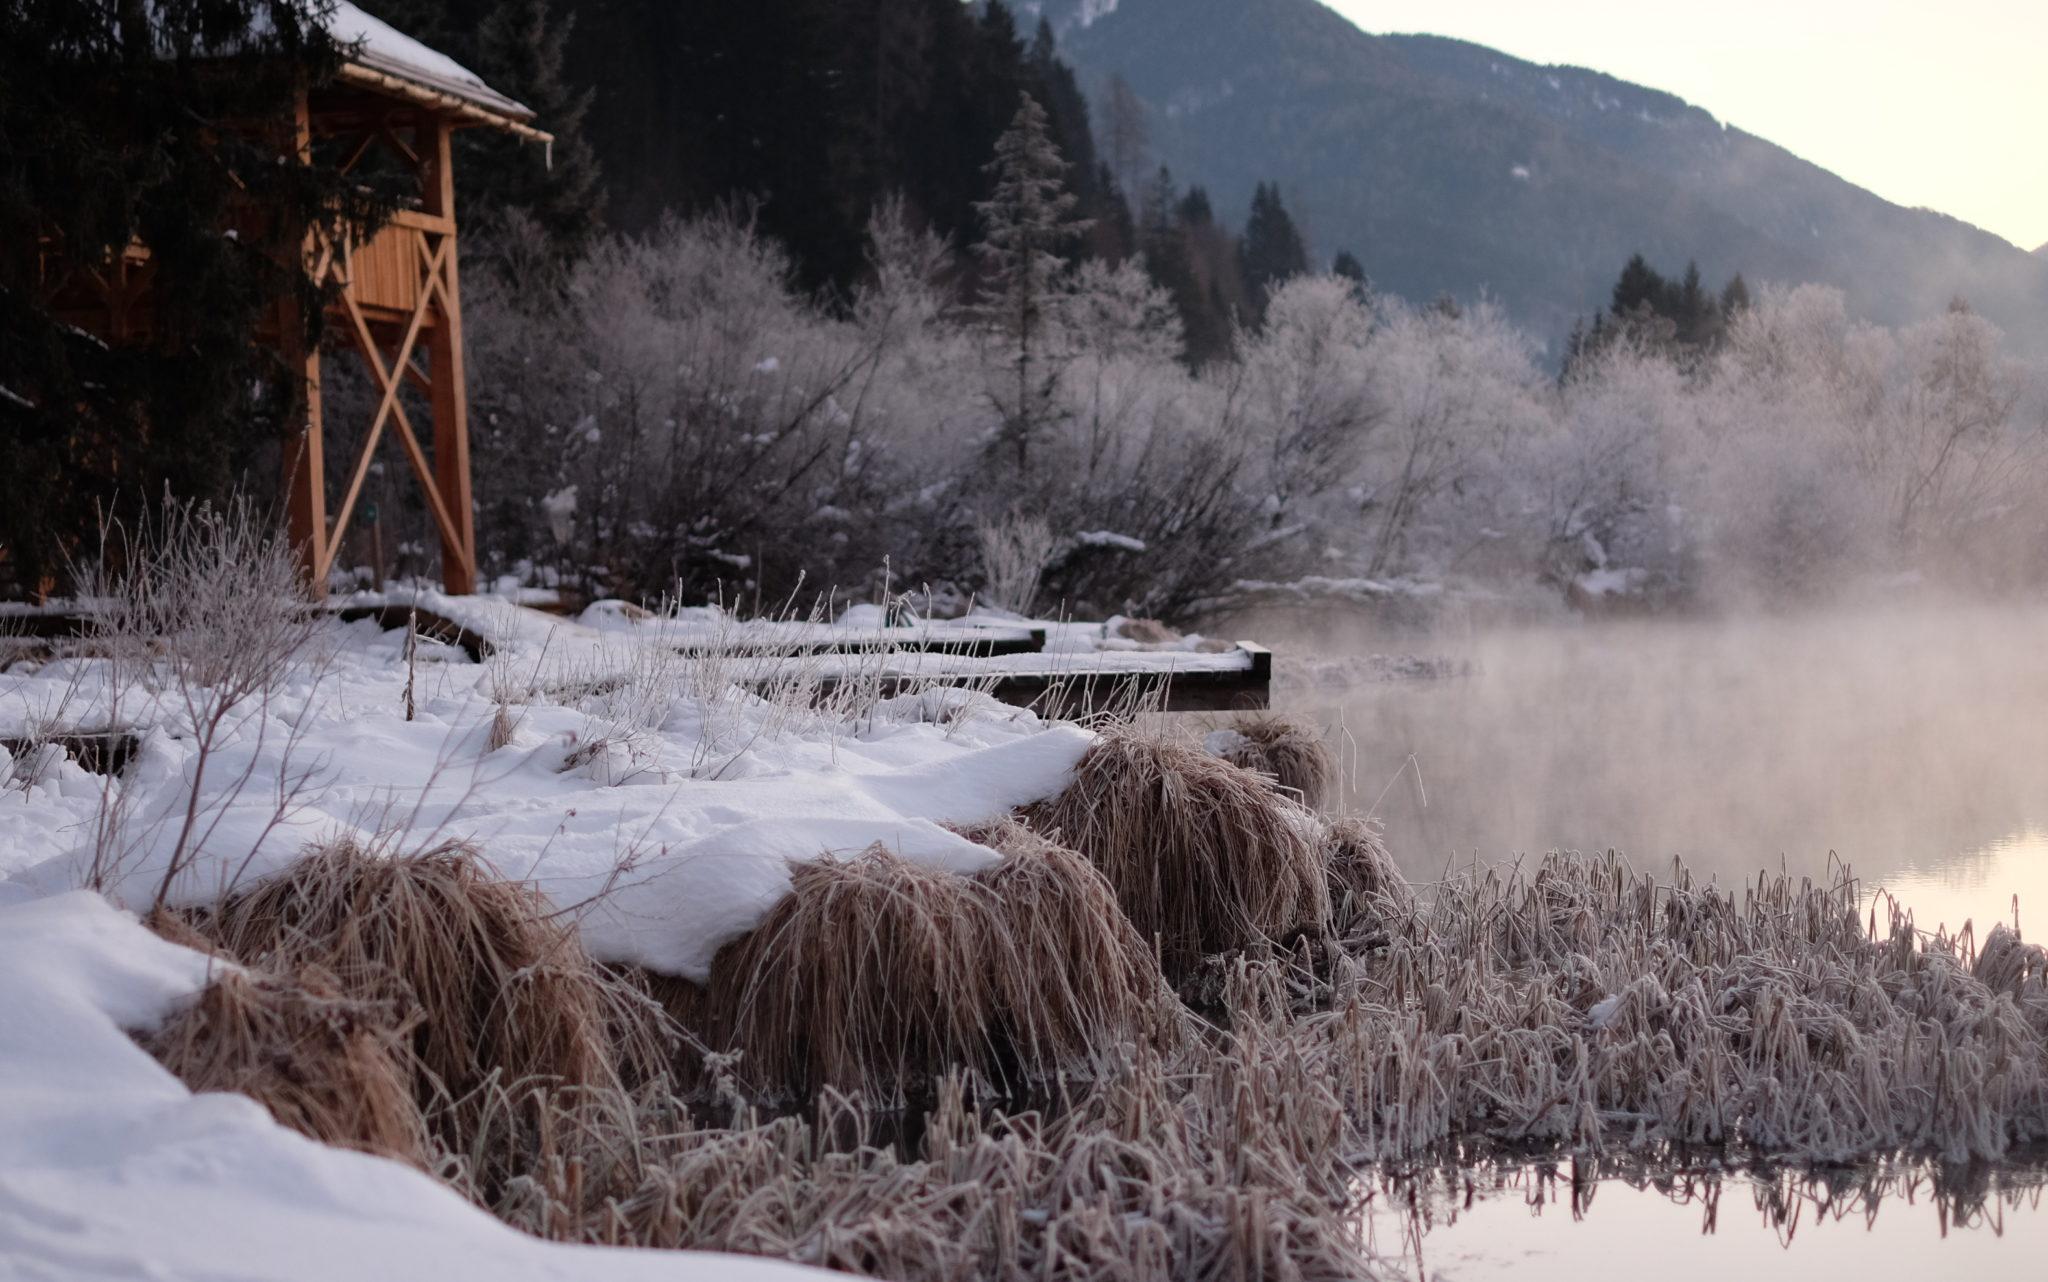 The Zelenci Springs near Kranjska Gora